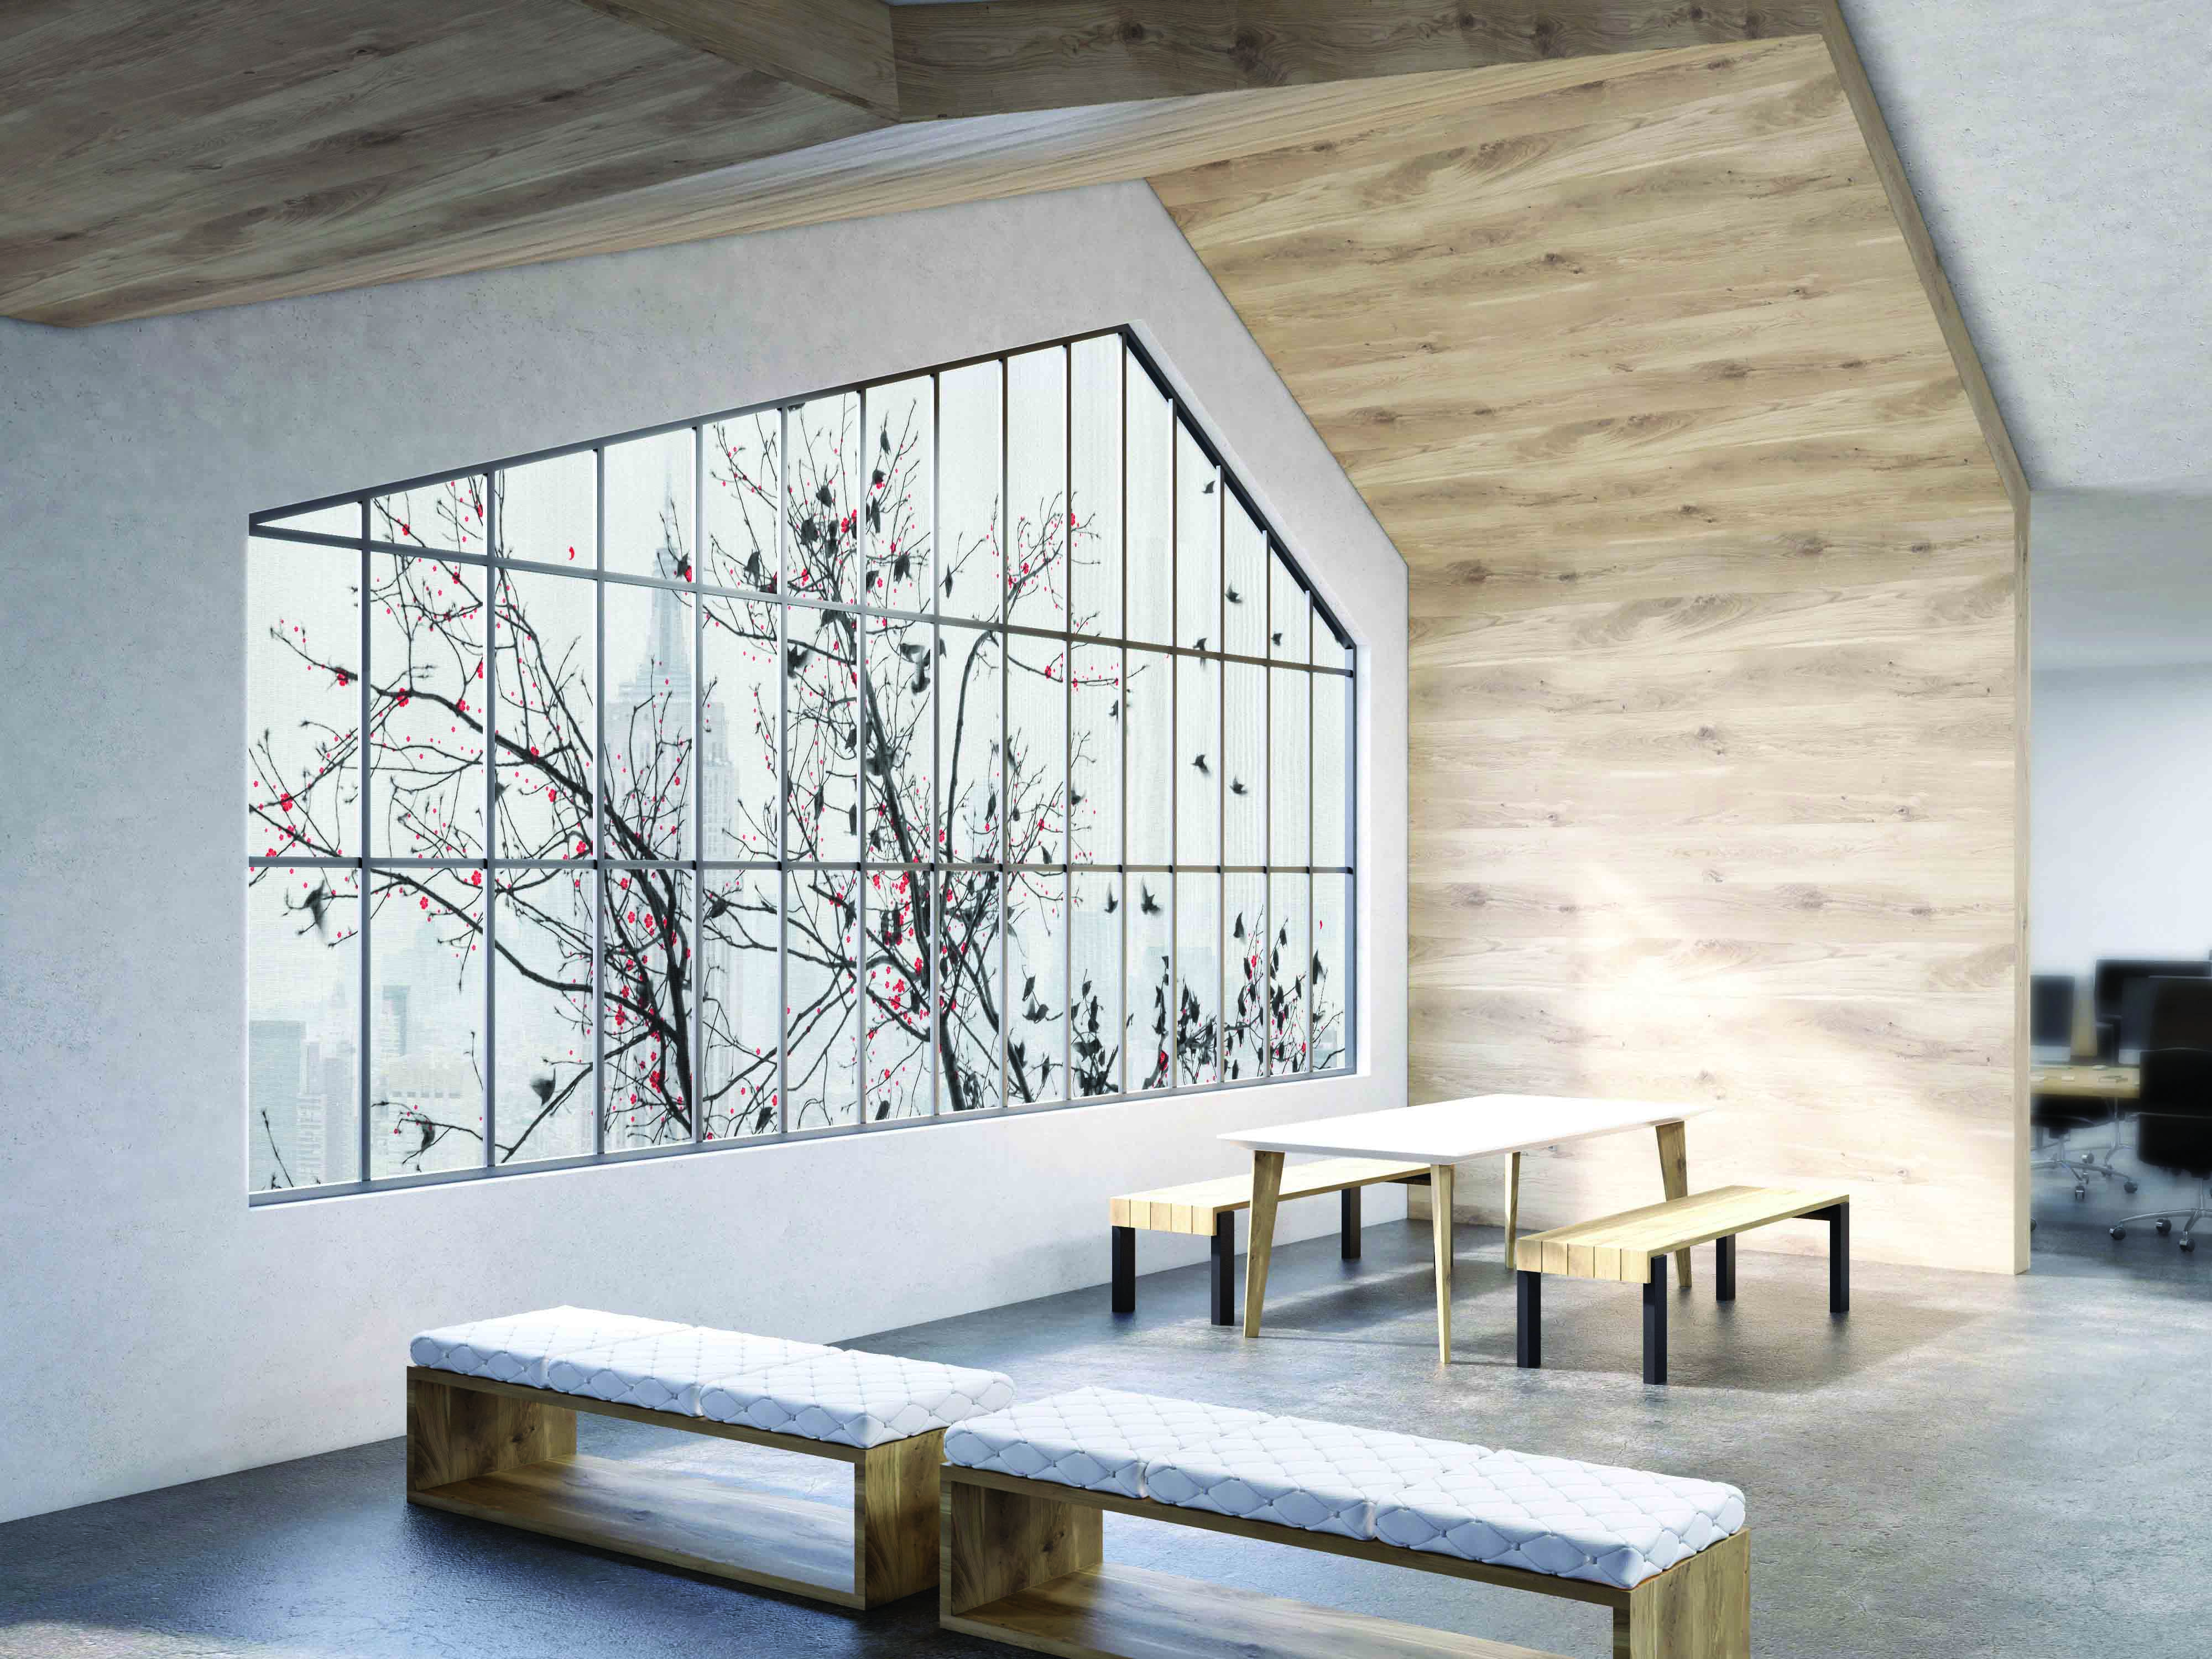 Window graphics help define a space.